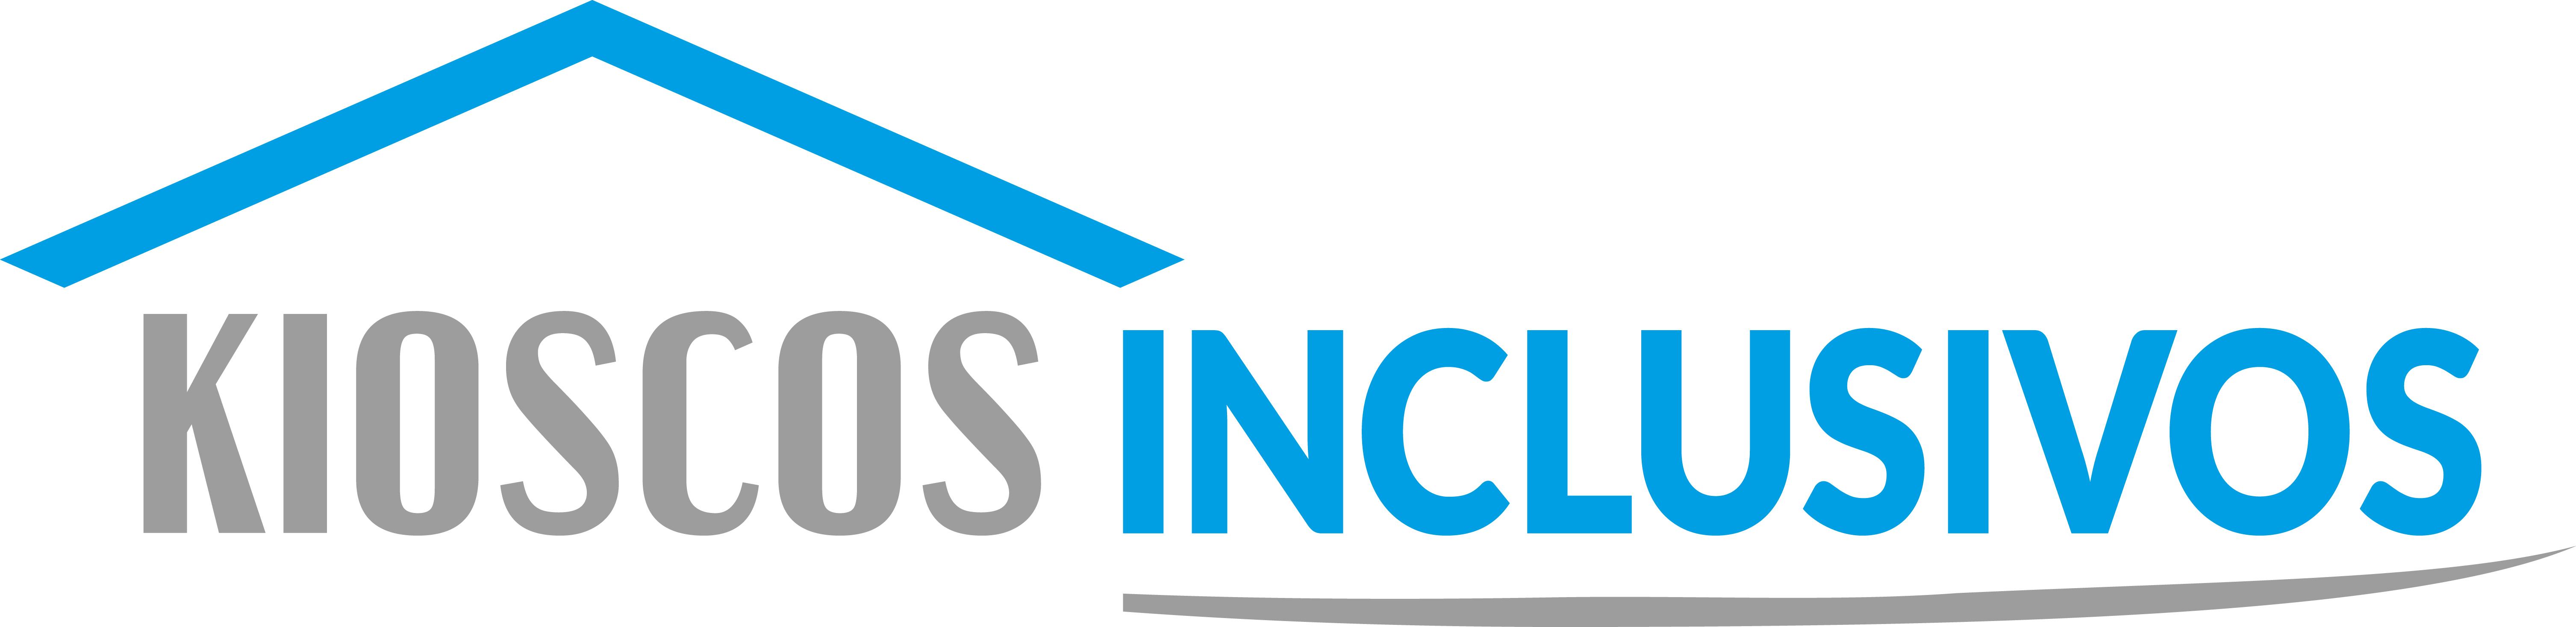 Kioscos Inclusivos